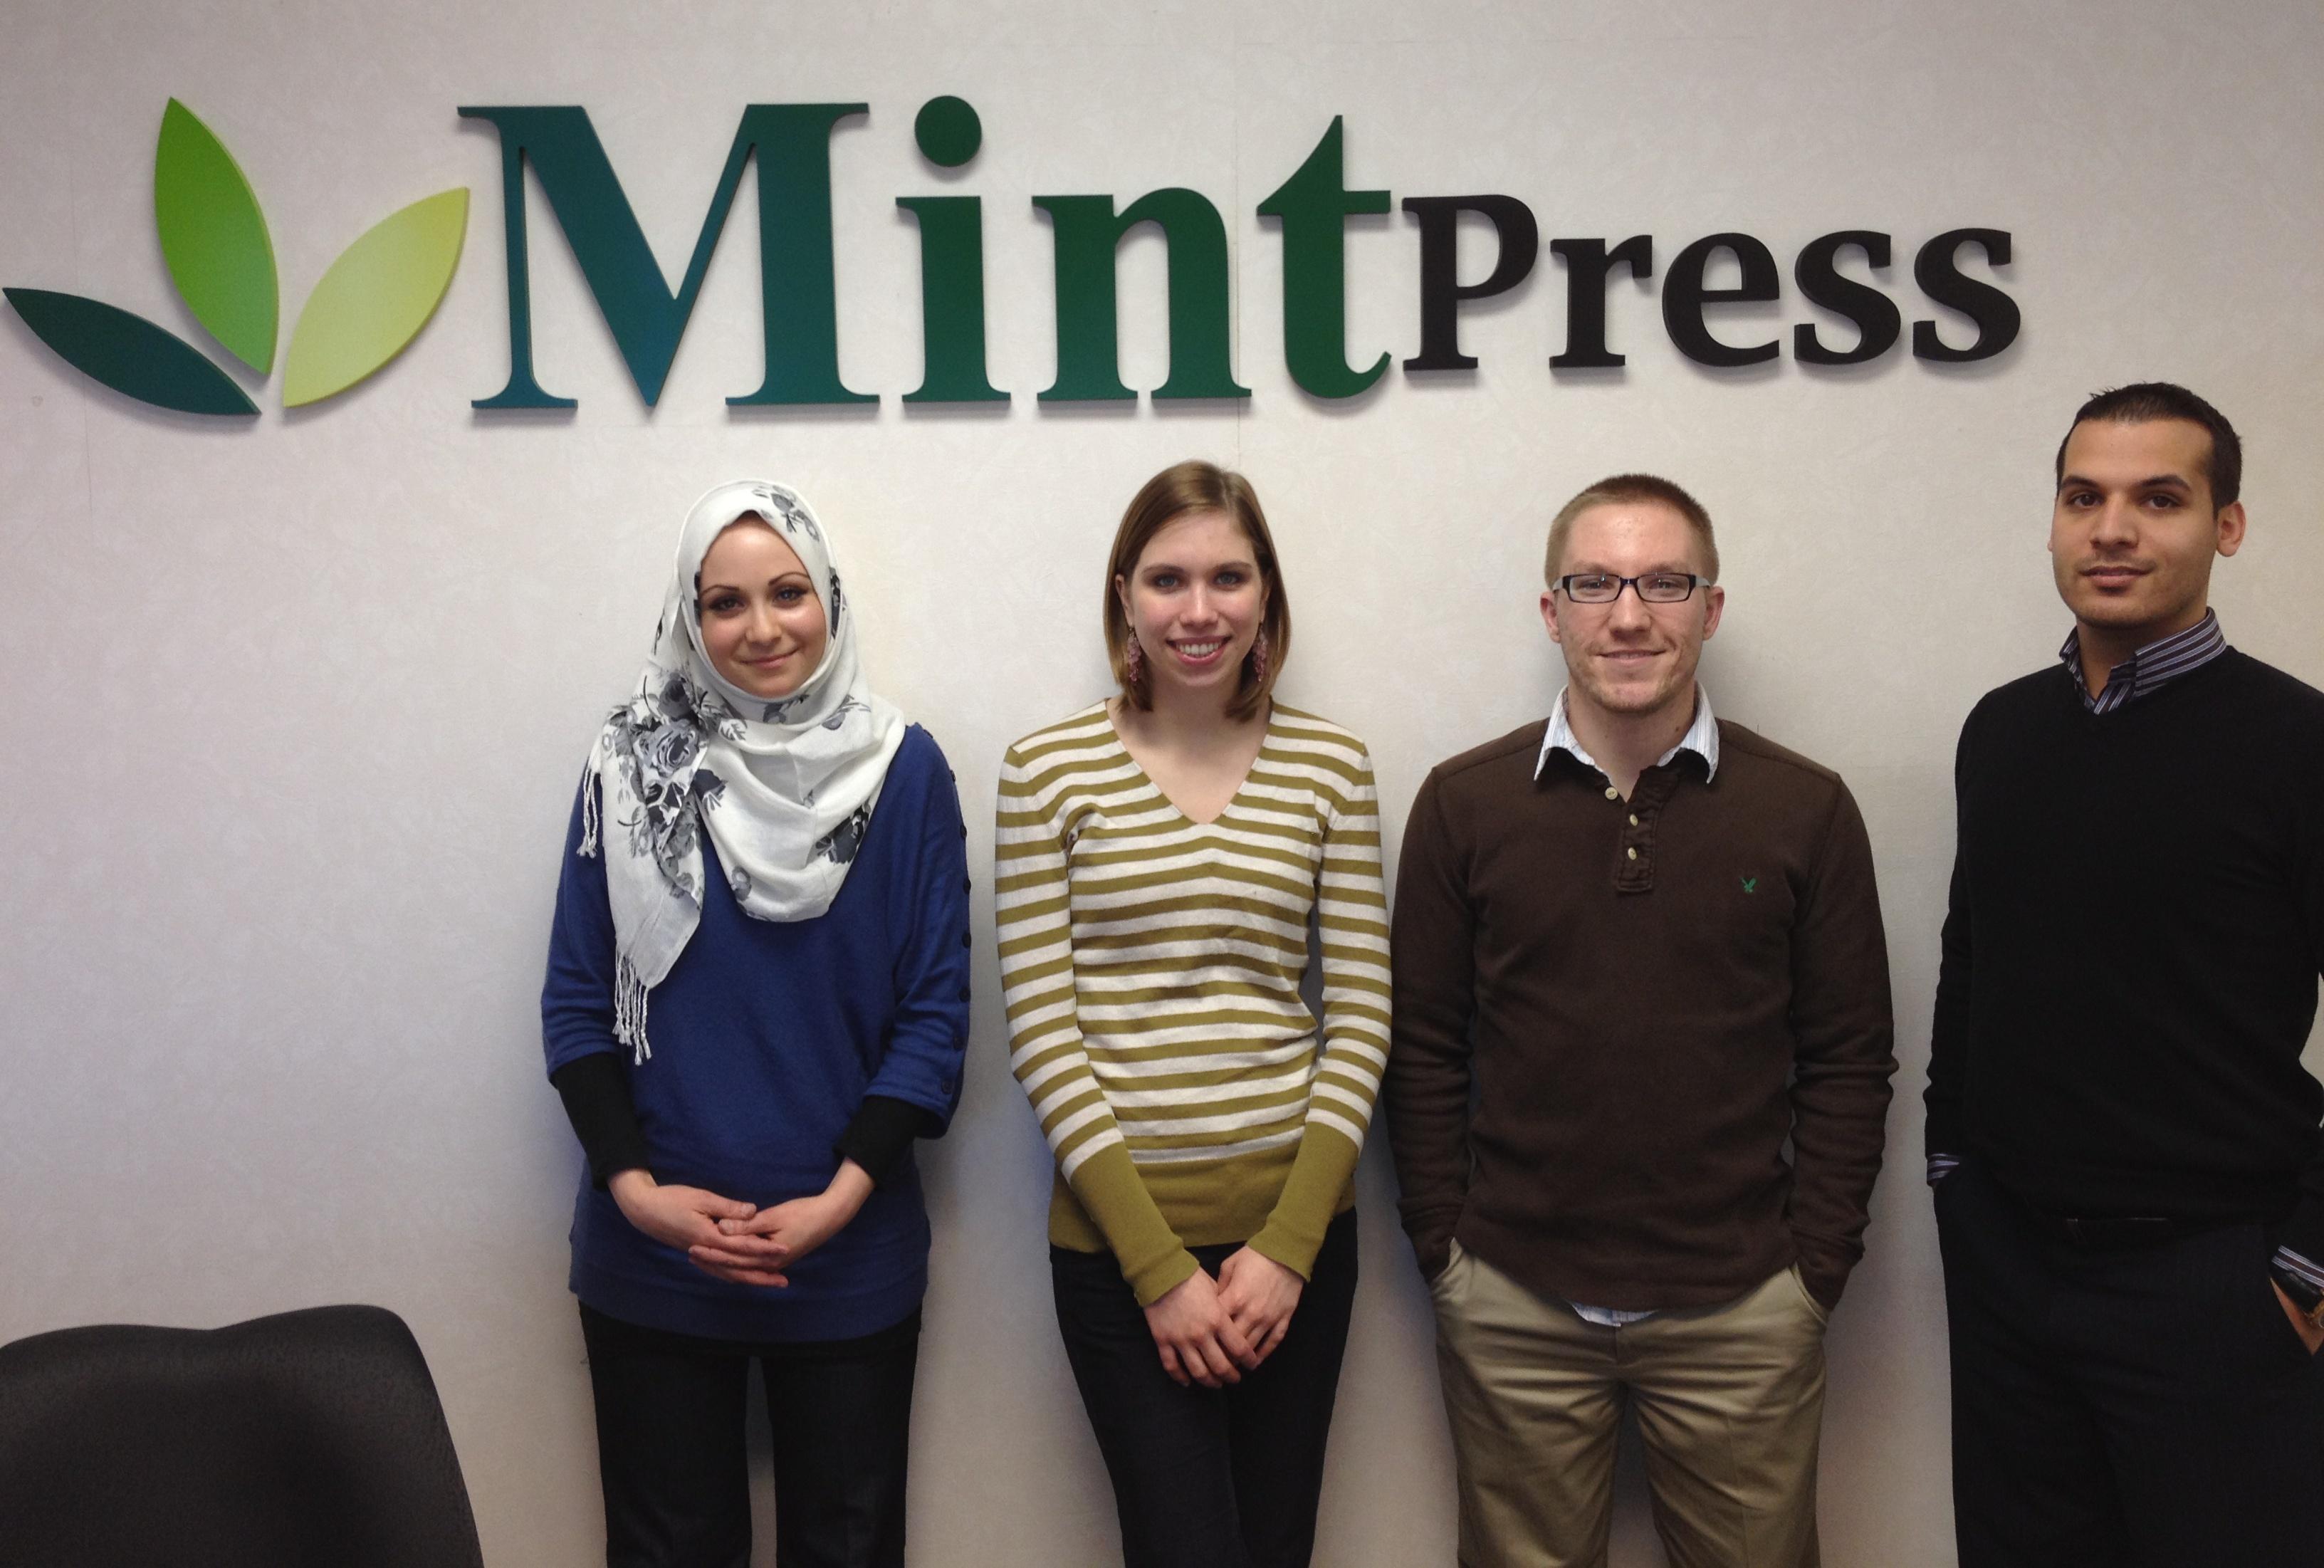 Some of the MintPress crew: Mnar Muhawesh, Janessa Schilmoeller, Joey LeMay and Muhammad Muhawesh